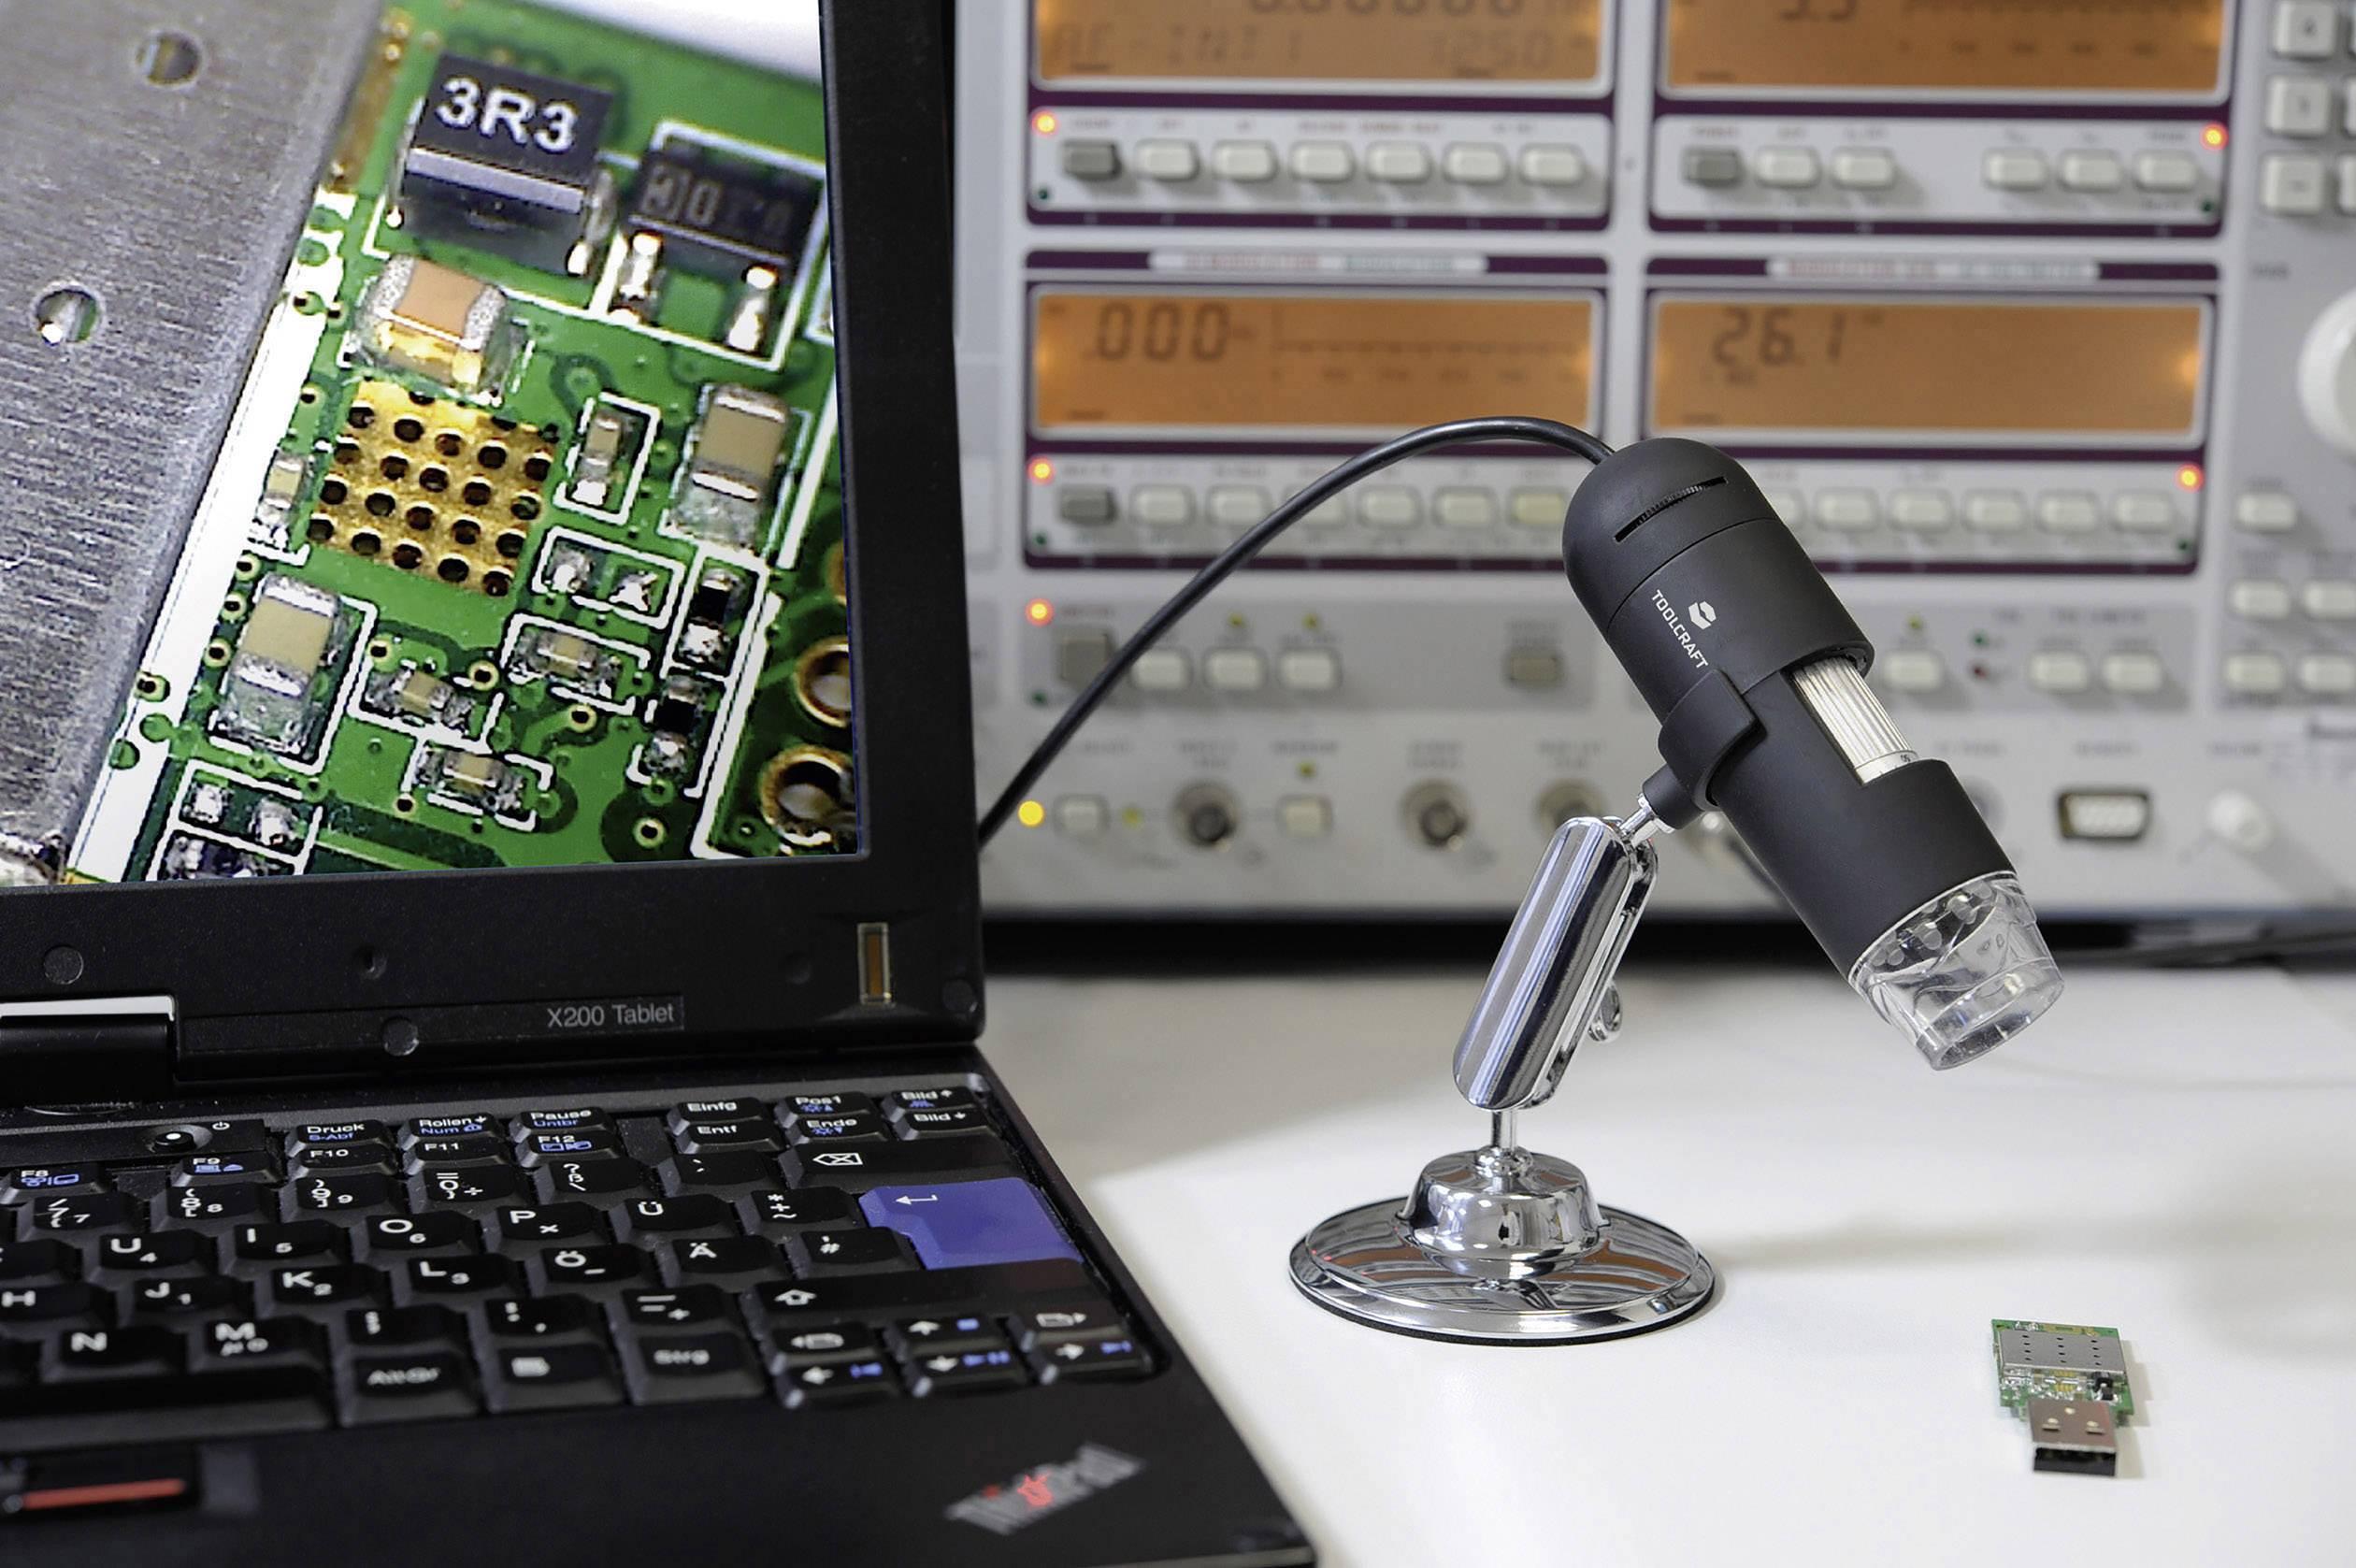 Usb mikroskop toolcraft mio pixel digitale vergrößerung max